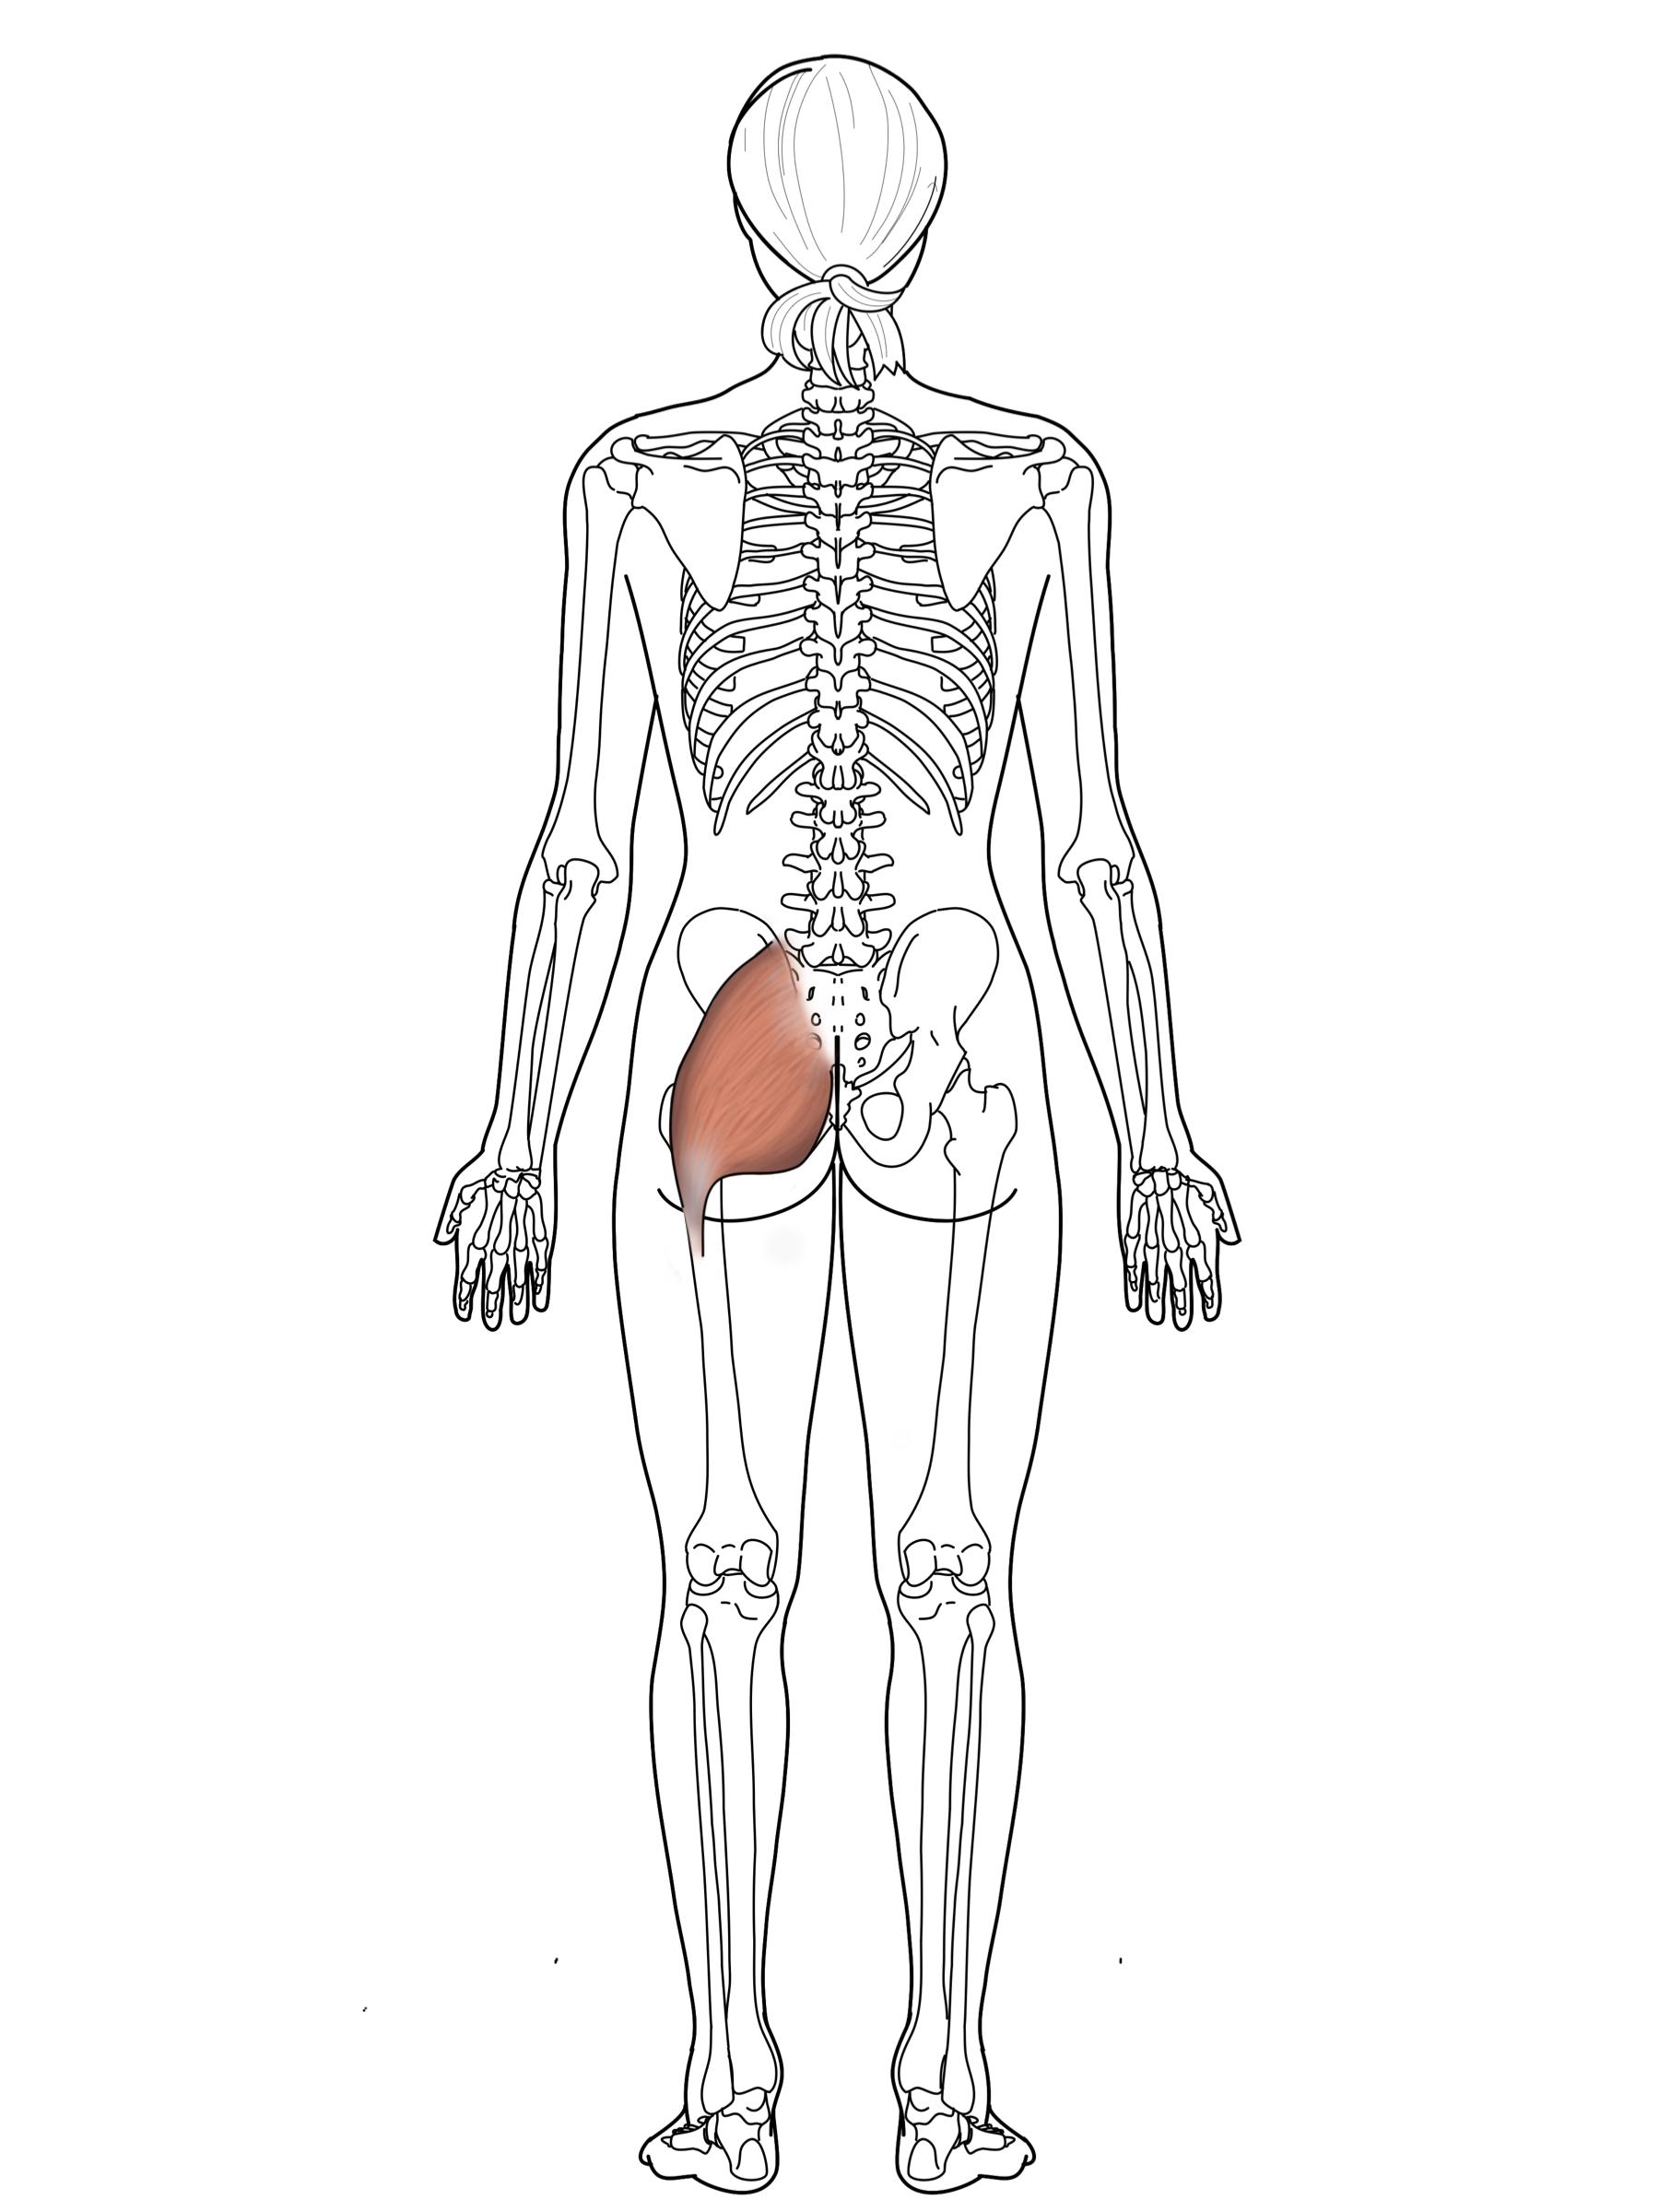 Origin: Pelvis / Sacrum  Insertion: IT Band  Action: Hip Abduction / ER  Innervation: L5/S2